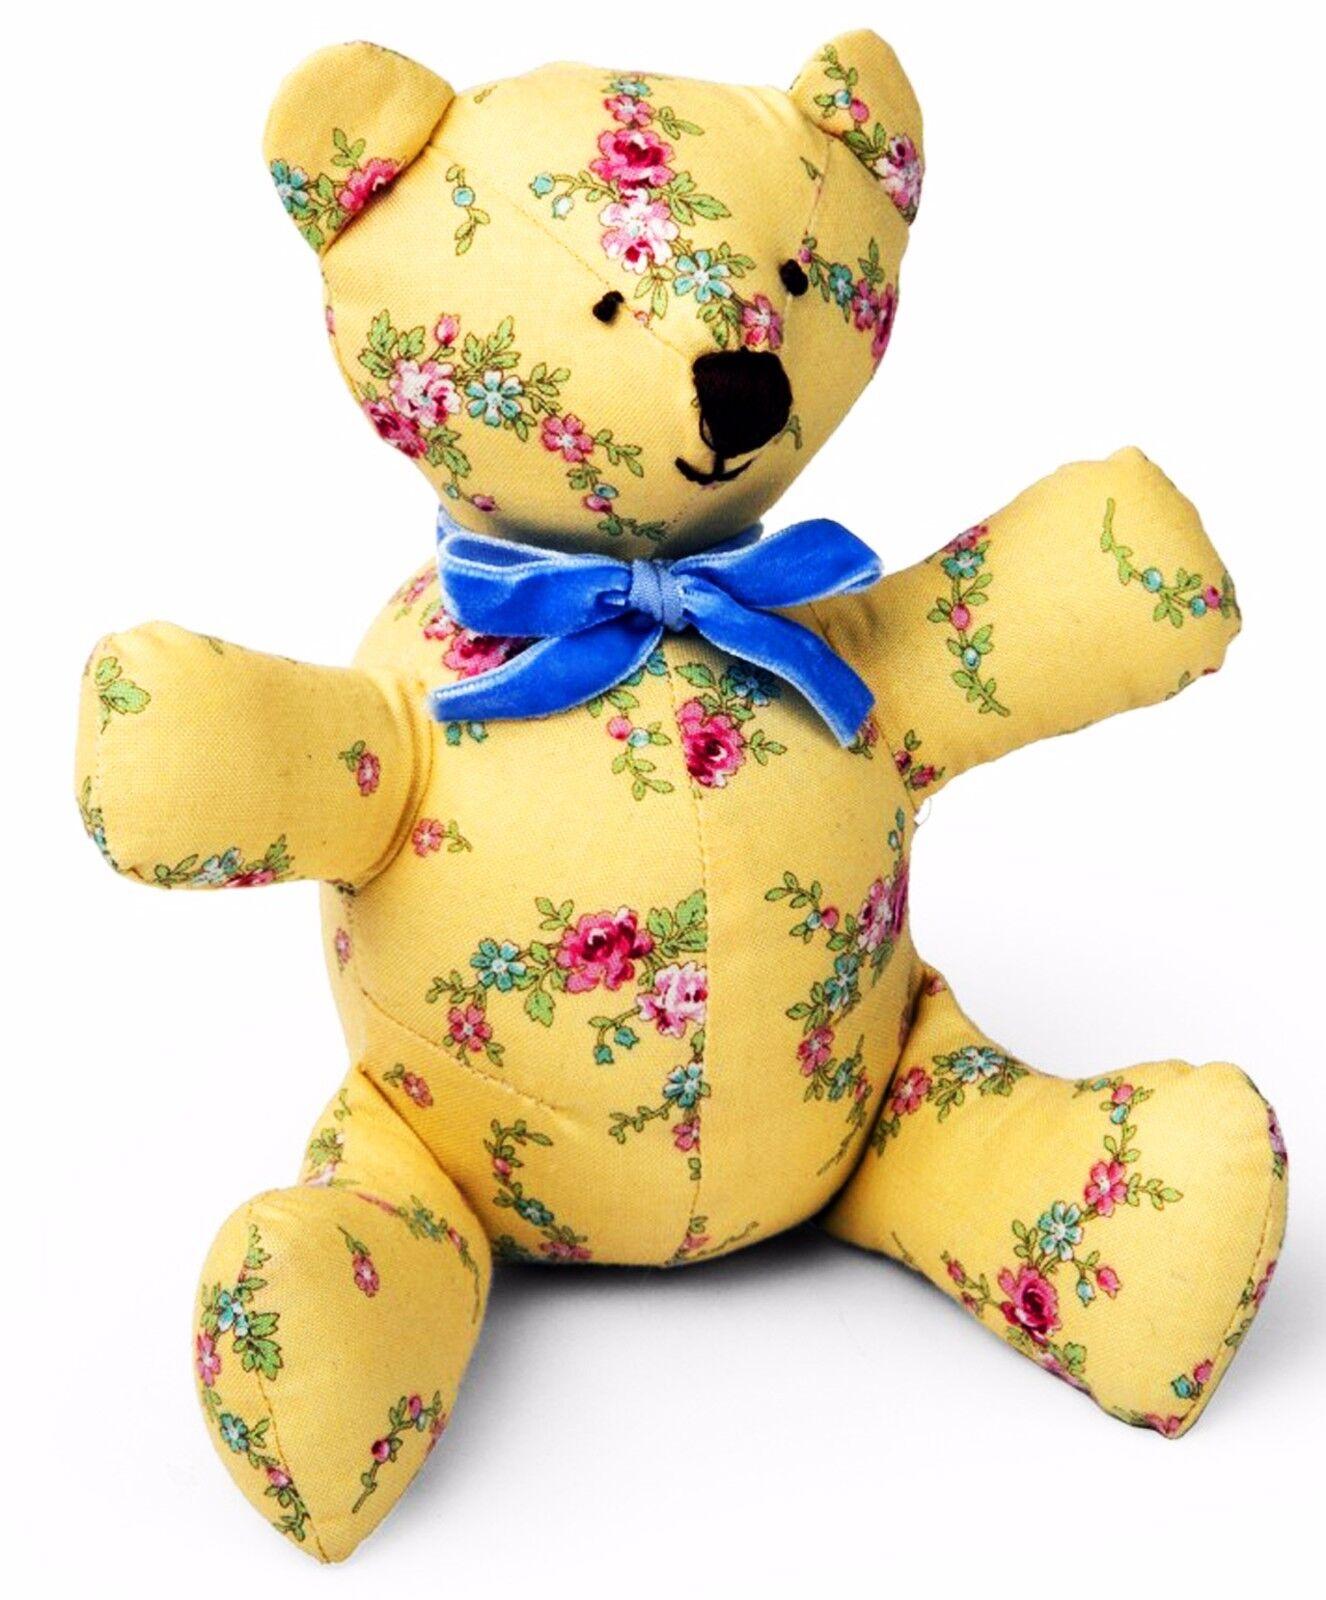 Sizzix Bigz Plus Bear Cub #660926 MSRP $49.99 by Kid Giddy Retired!